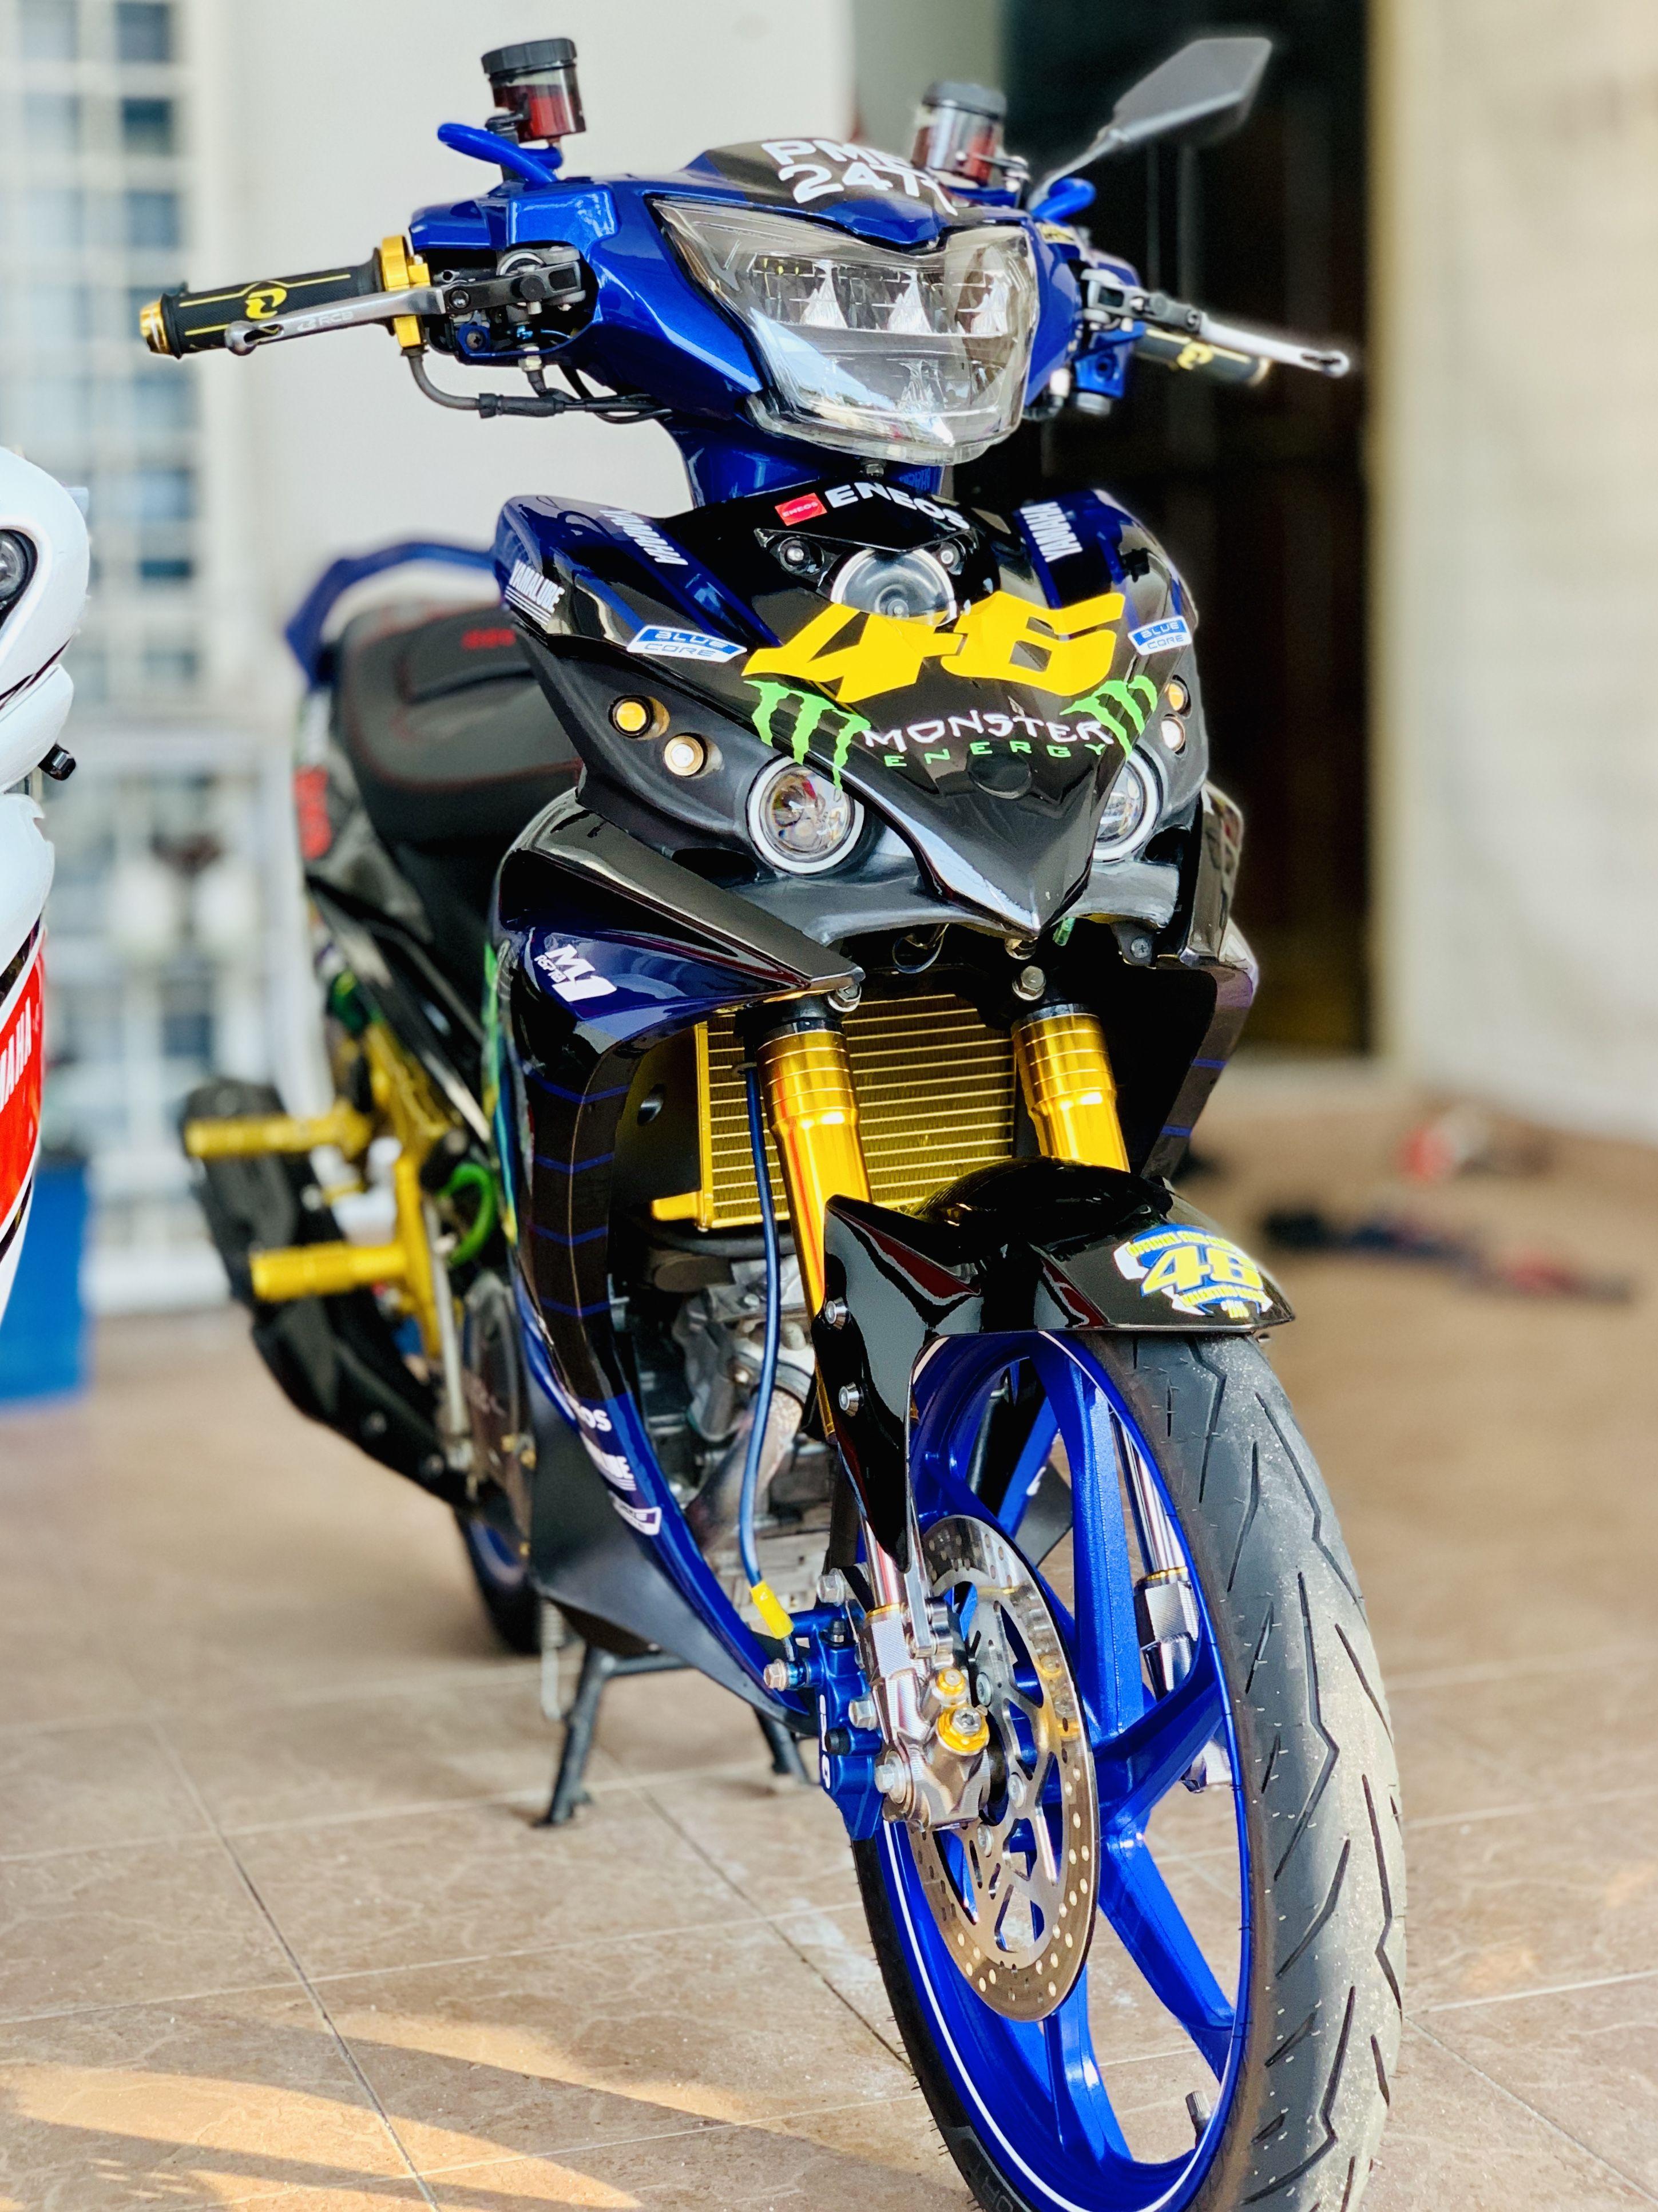 Yamaha Lc135 Motogp 46 Monster Energy Bike Rider Yamaha Motorcycles Motogp